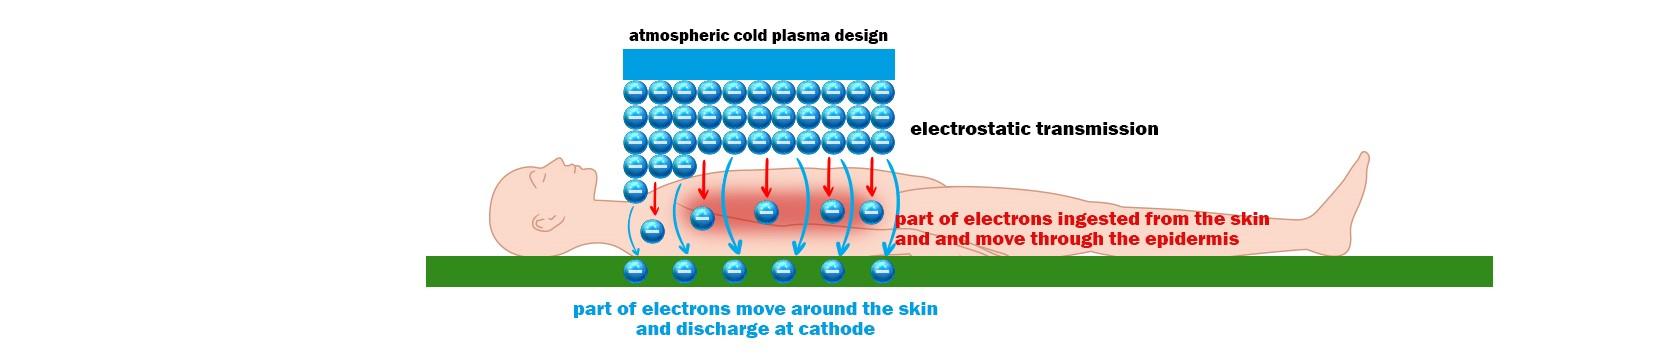 CAP Behandlung Cold Plasma Therapie